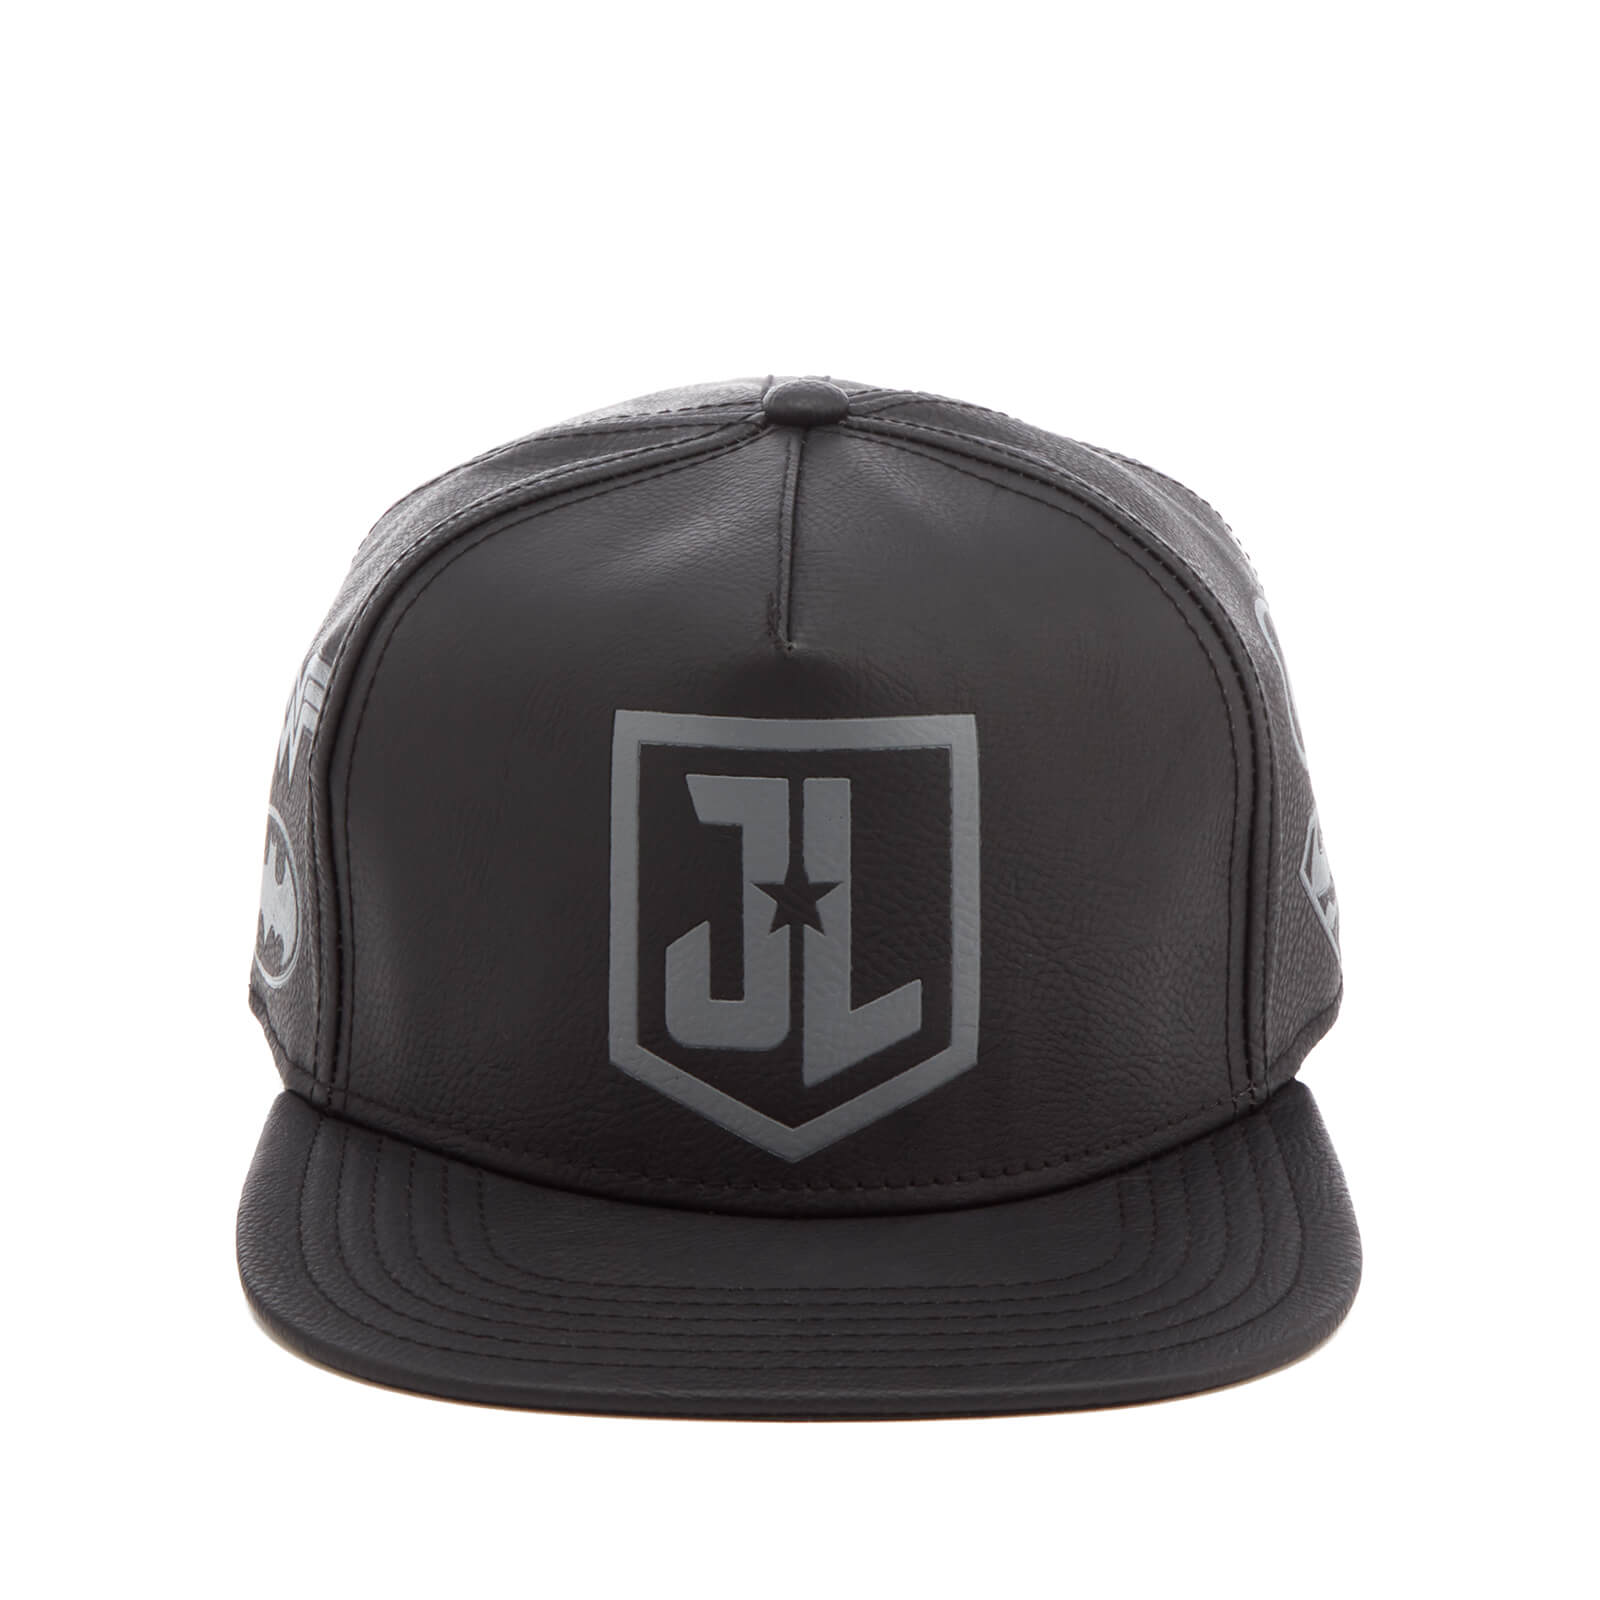 1f2e136721884e DC Comics Justice League Men's Debossed Logo Cap - Black. Product Details